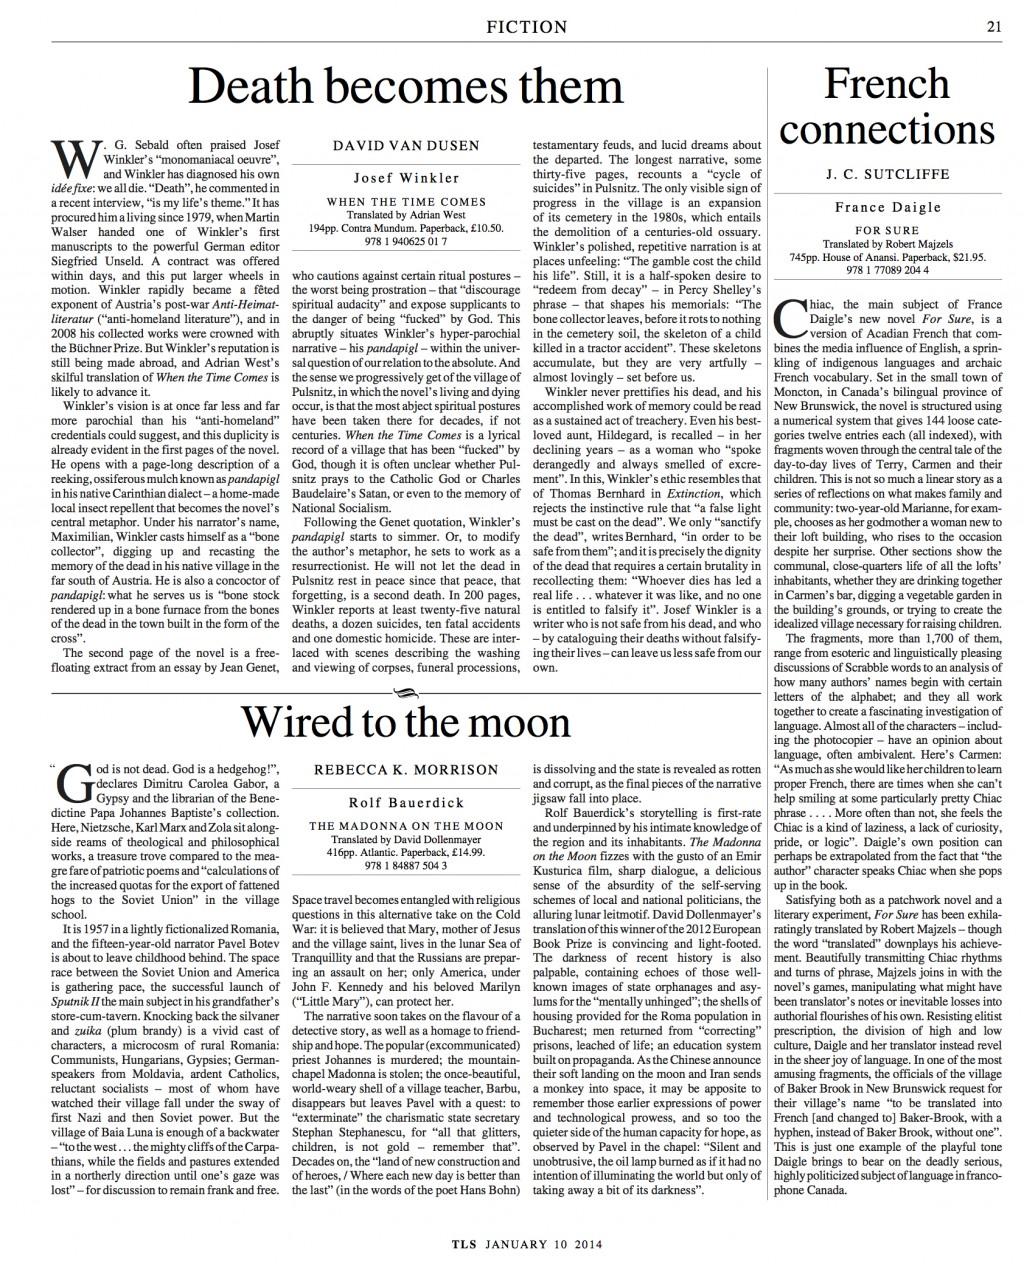 010 Essay Example Tls Josef Winkler Translate My Into Remarkable Spanish Large